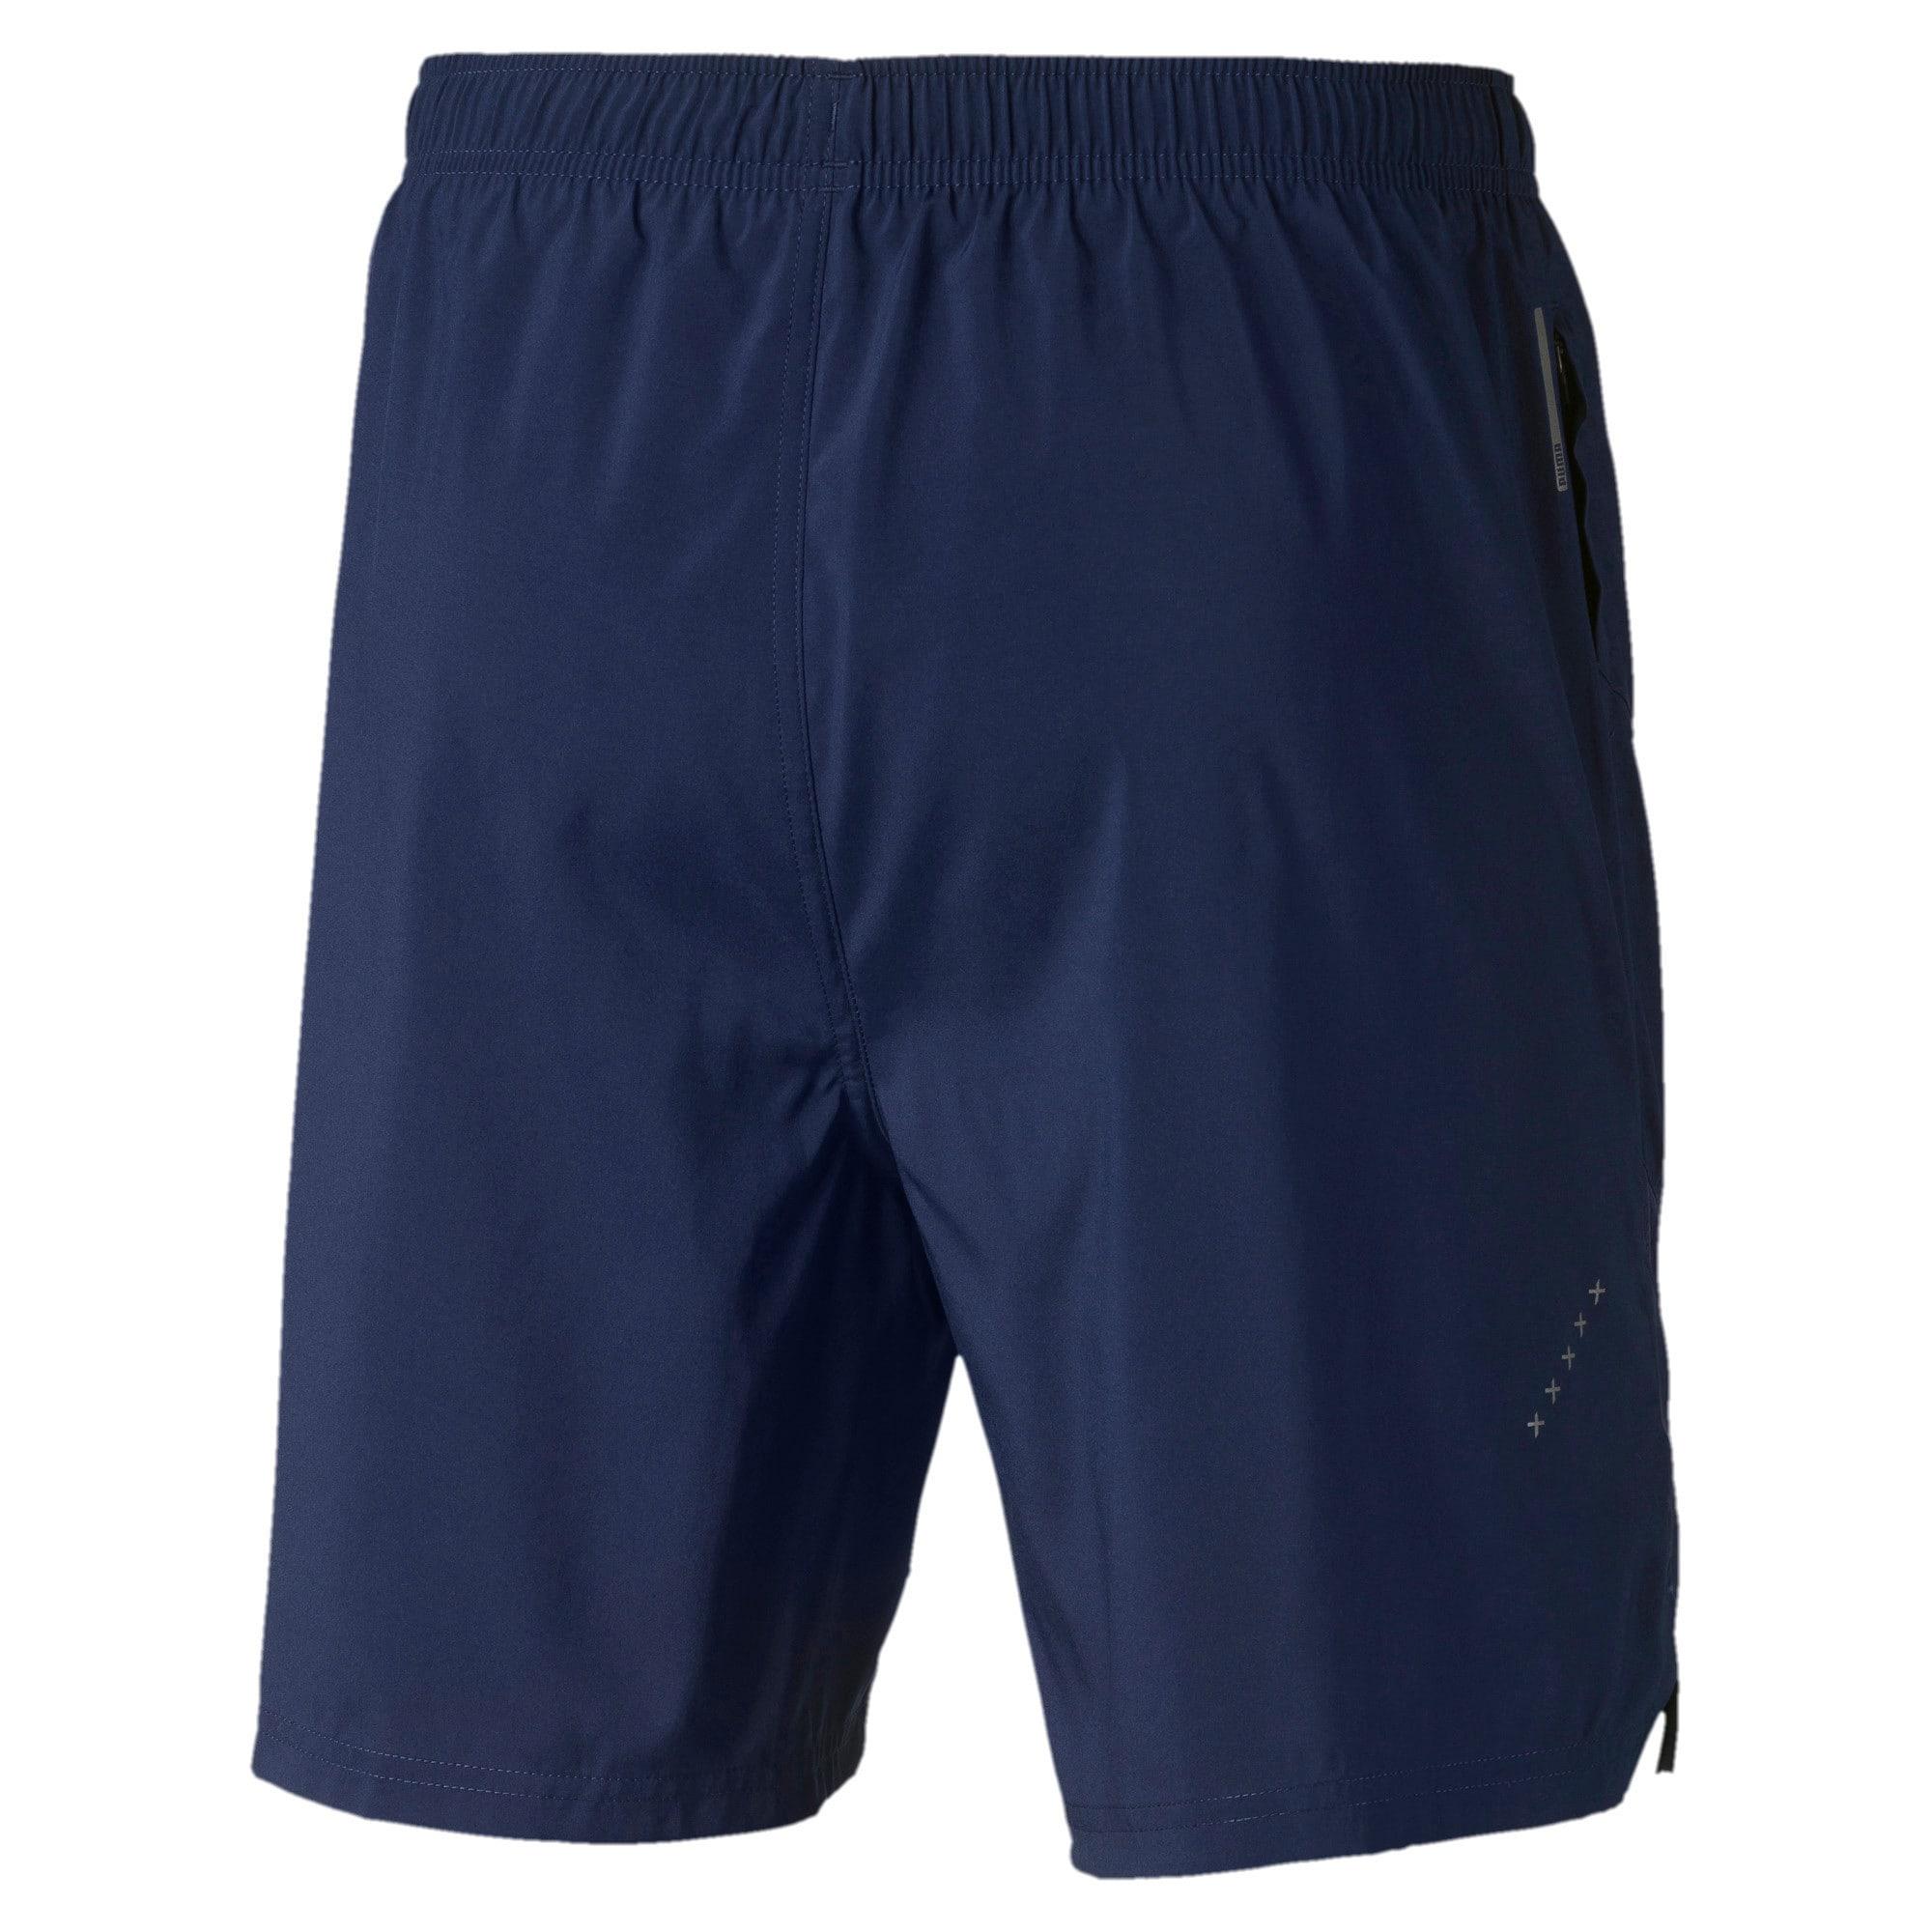 Thumbnail 5 of IGNITE Woven Men's Training Shorts, Peacoat, medium-IND